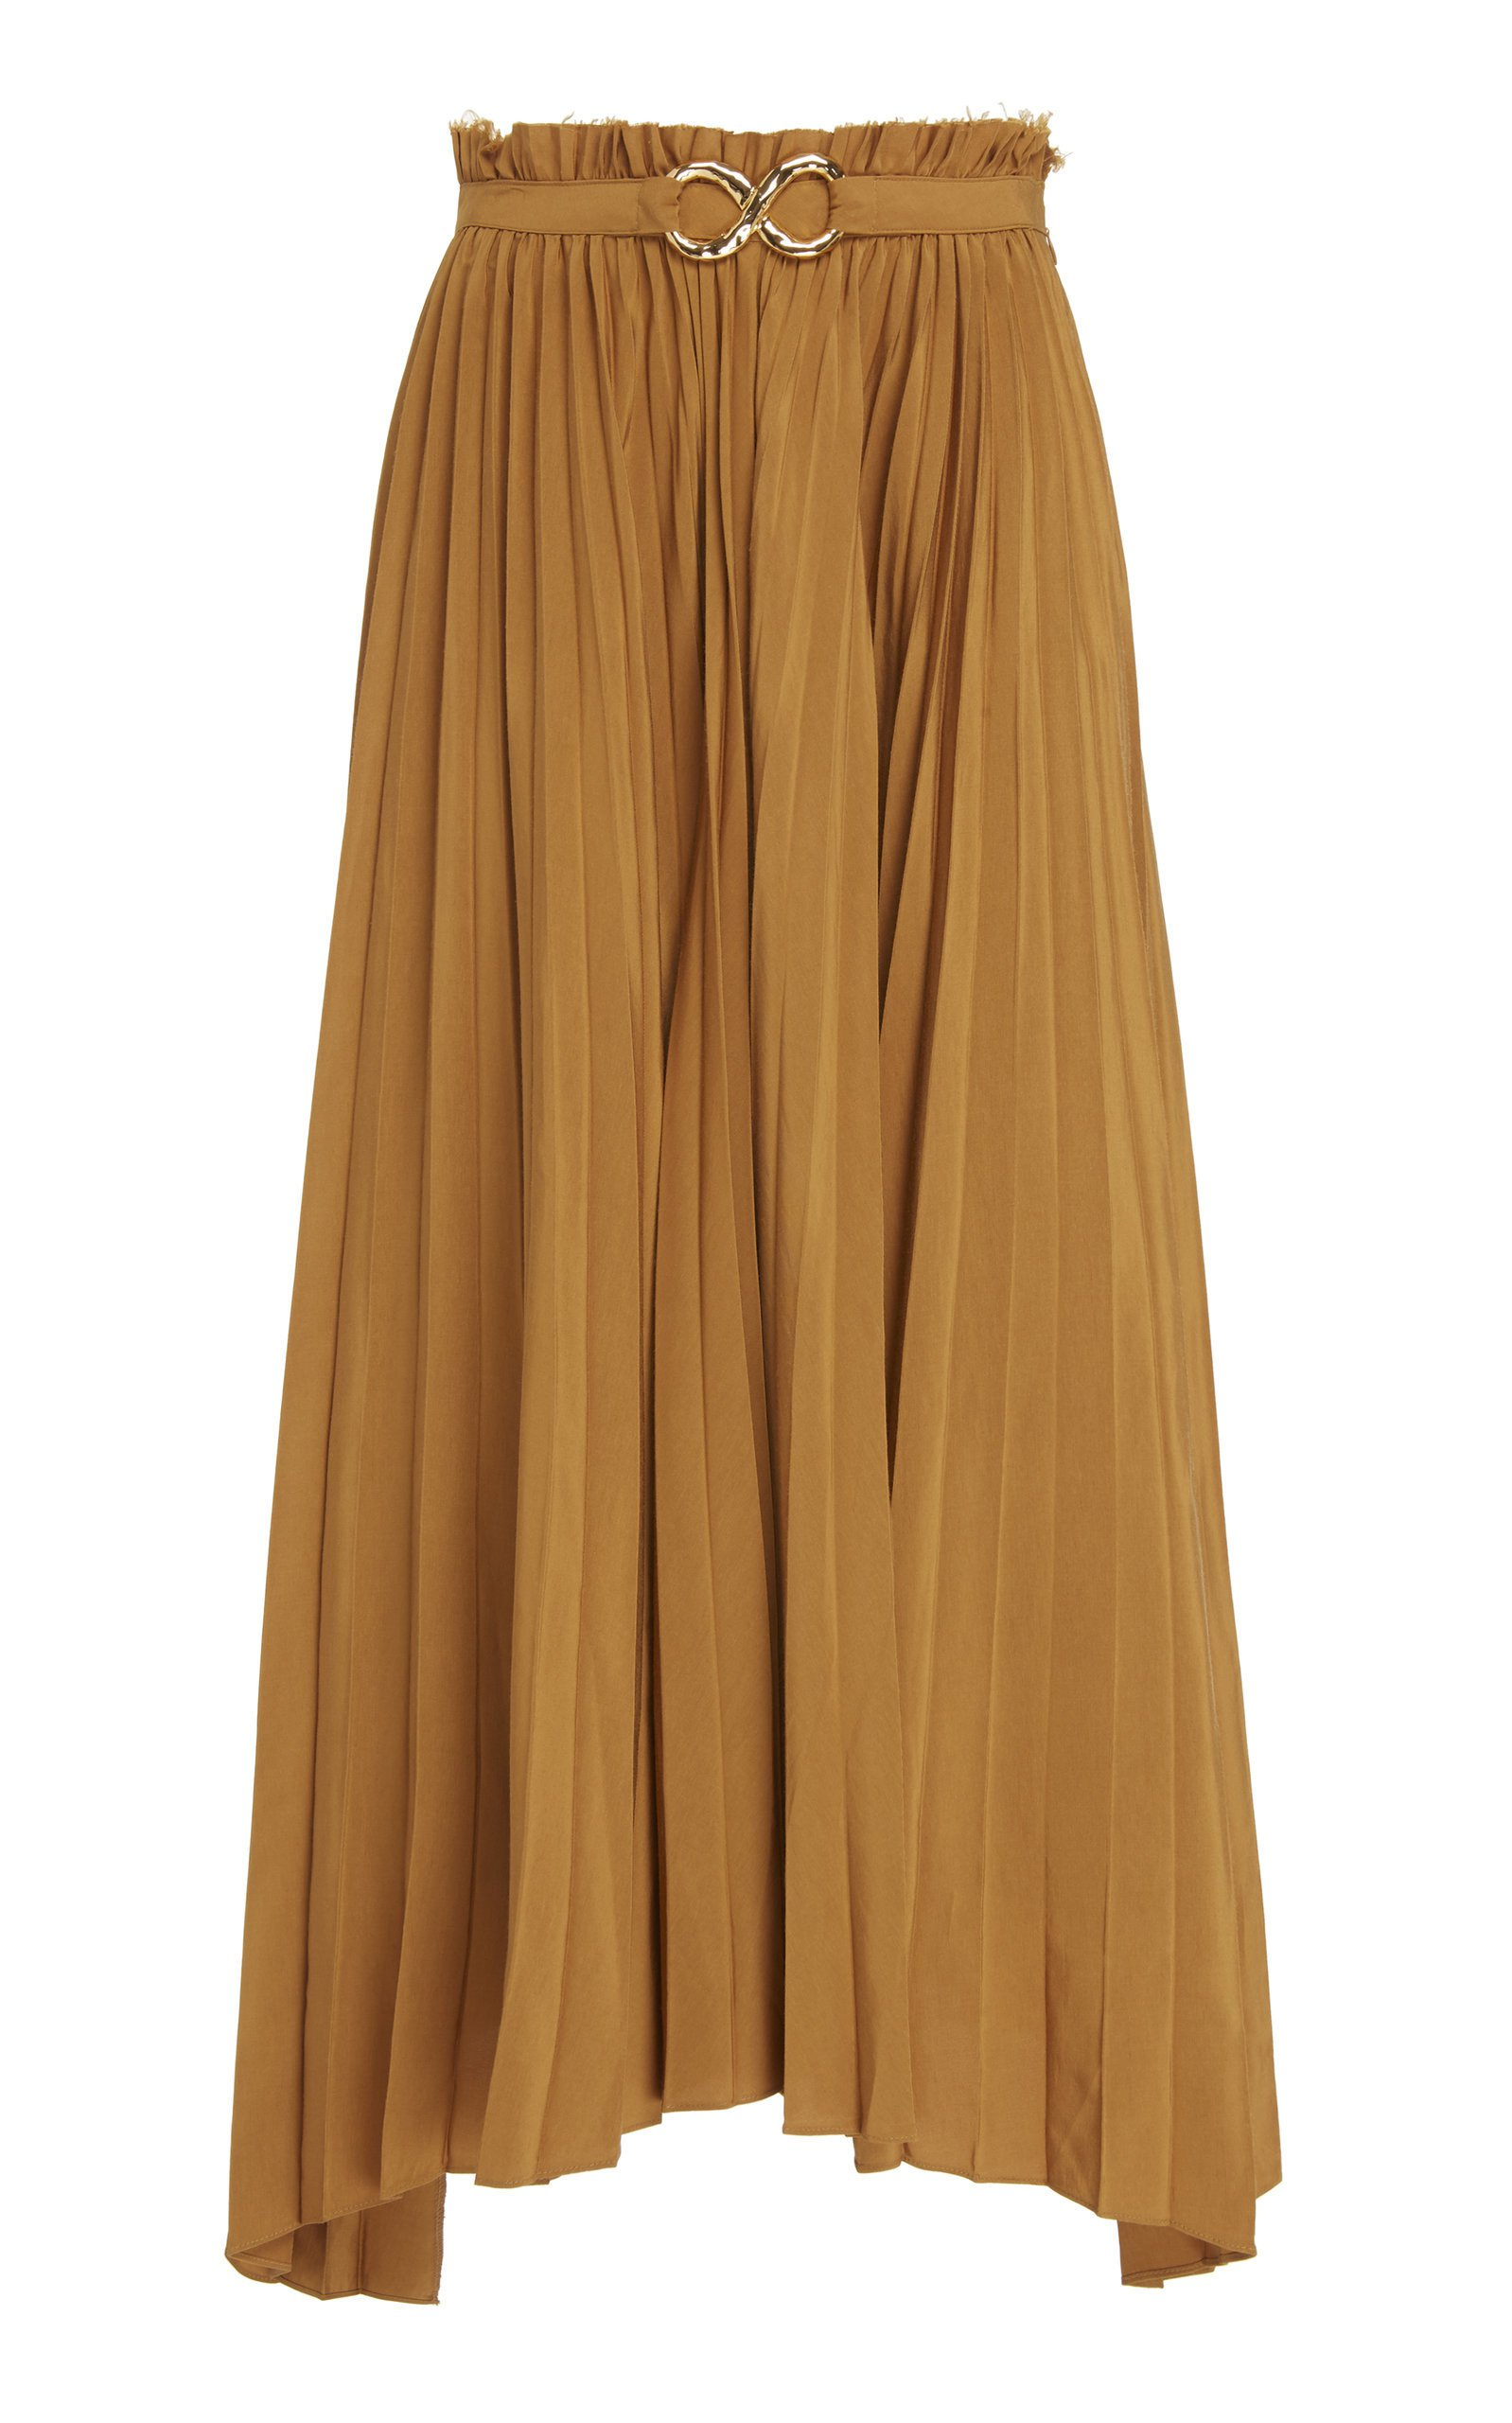 Rejina Pyo Kiera Pleated Satin Midi Skirt Size: 10